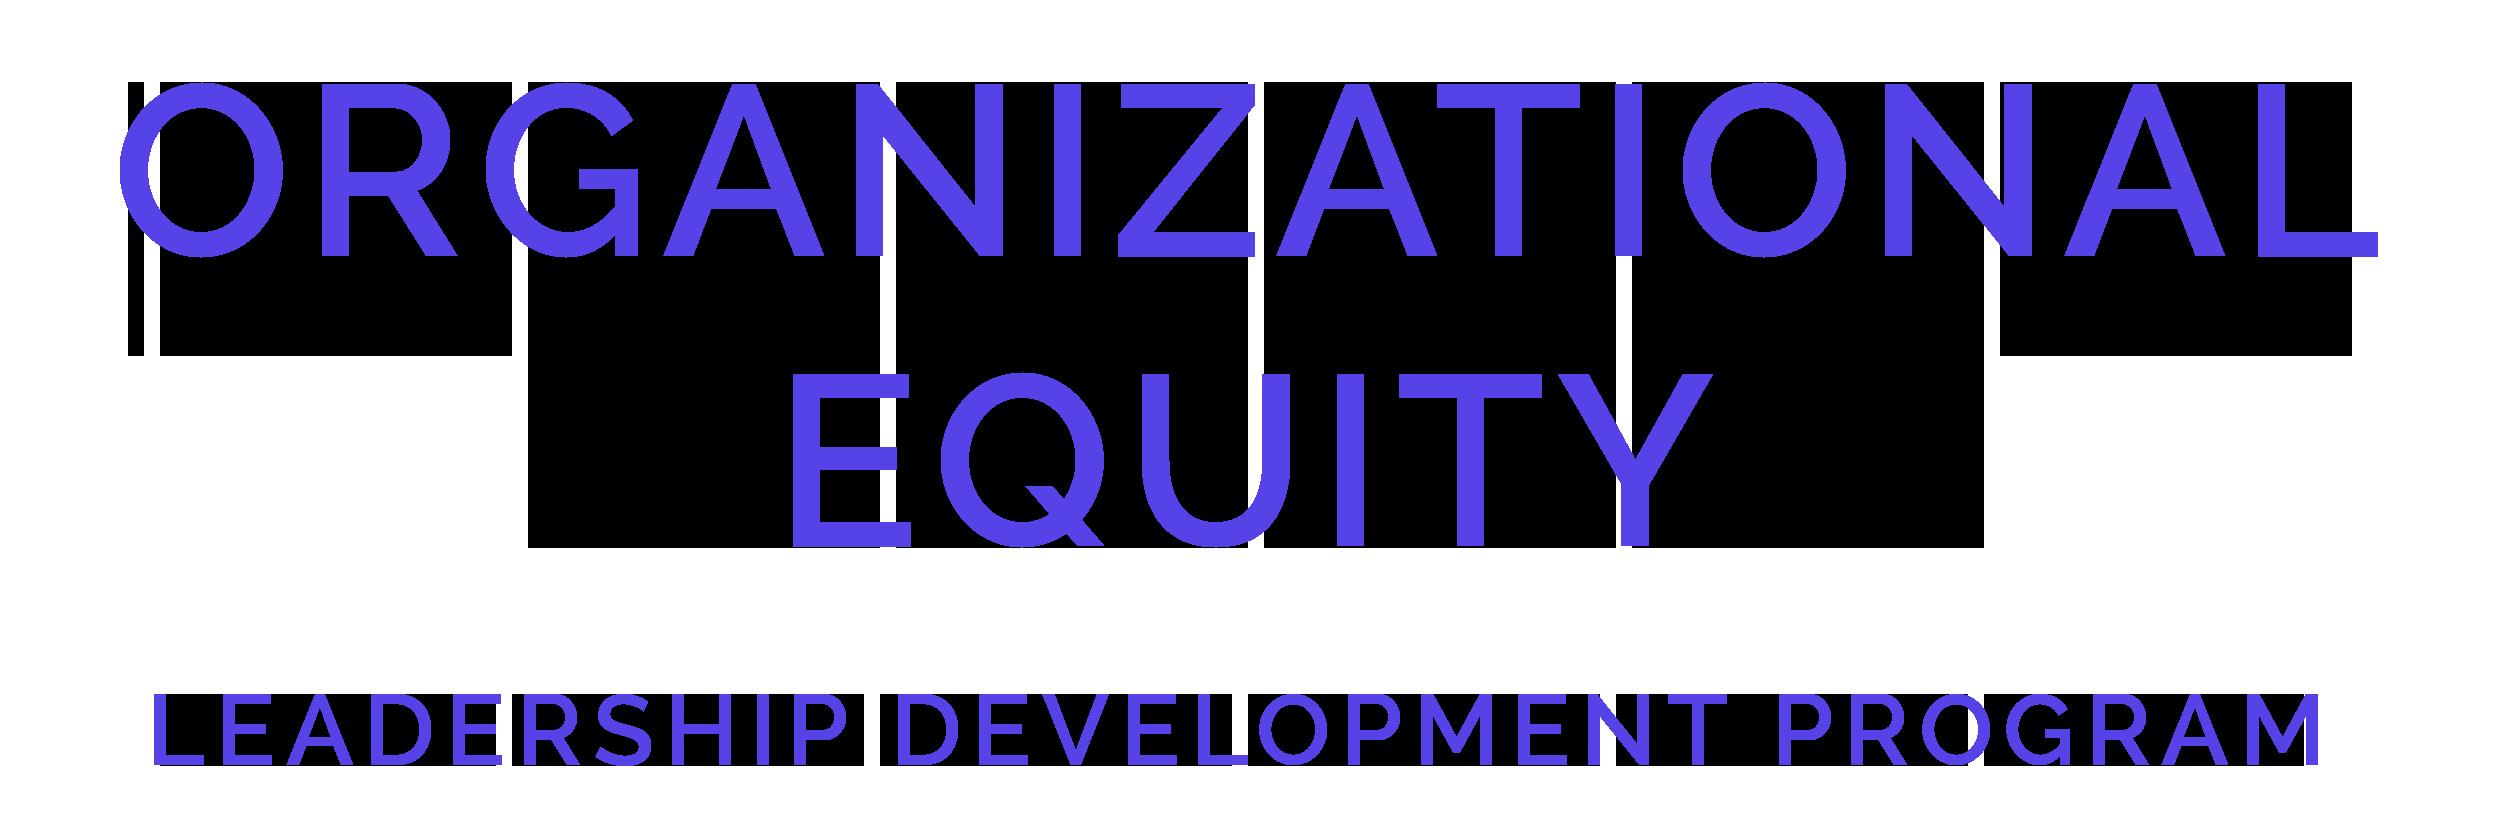 Organizational Equity Leadership Development Program